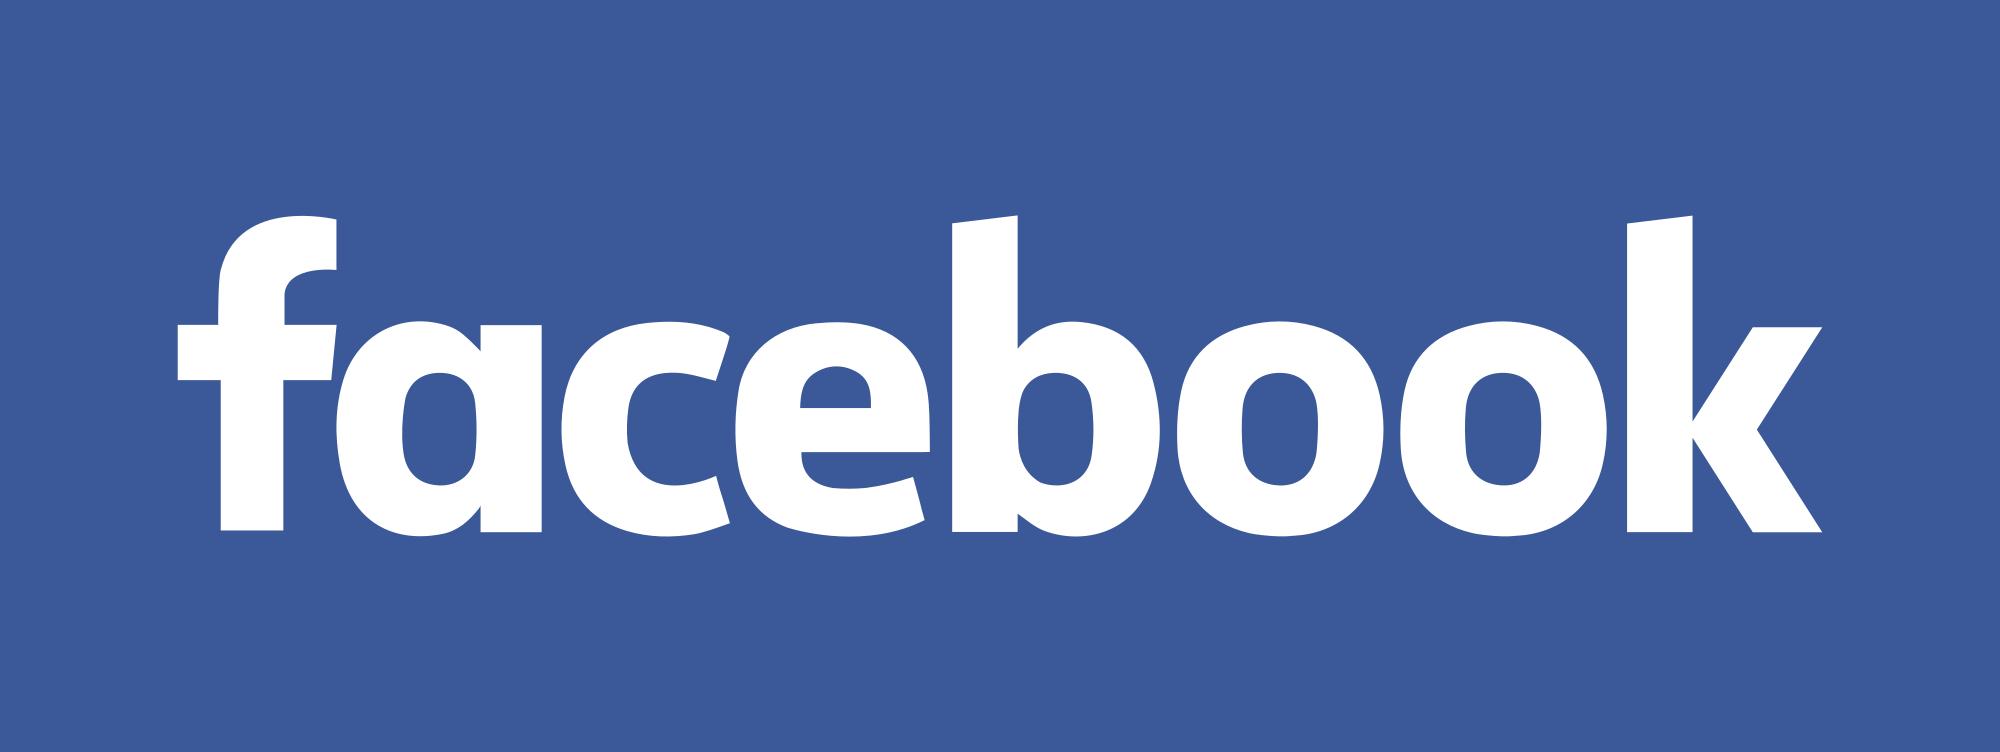 Facebook To Combine Messenger, Instagram,WhatsApp By 2020